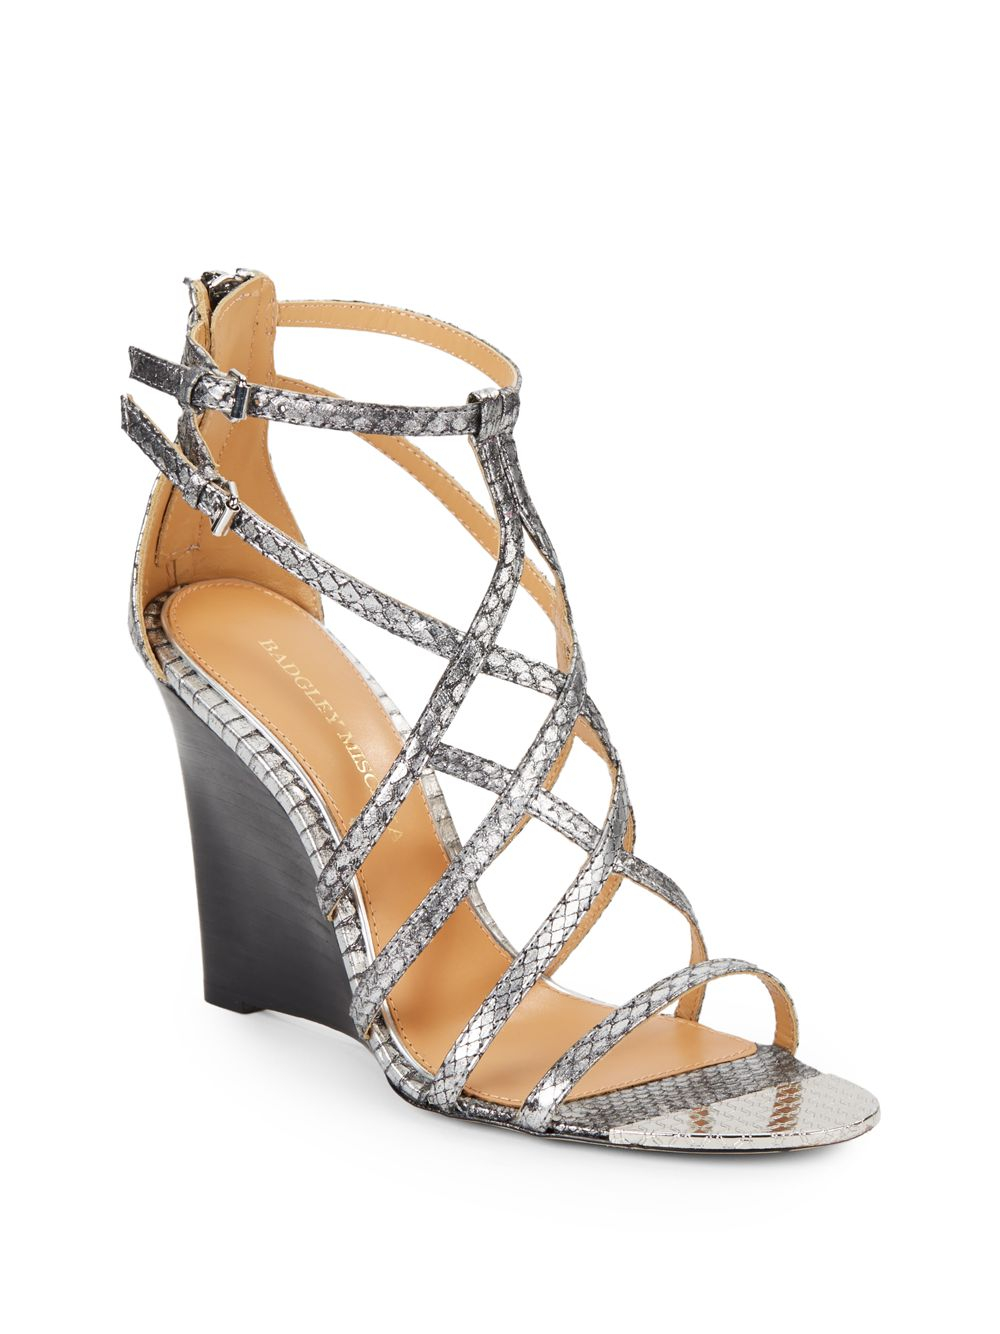 Badgley Mischka Mora Snake Embossed Leather Wedge Sandals